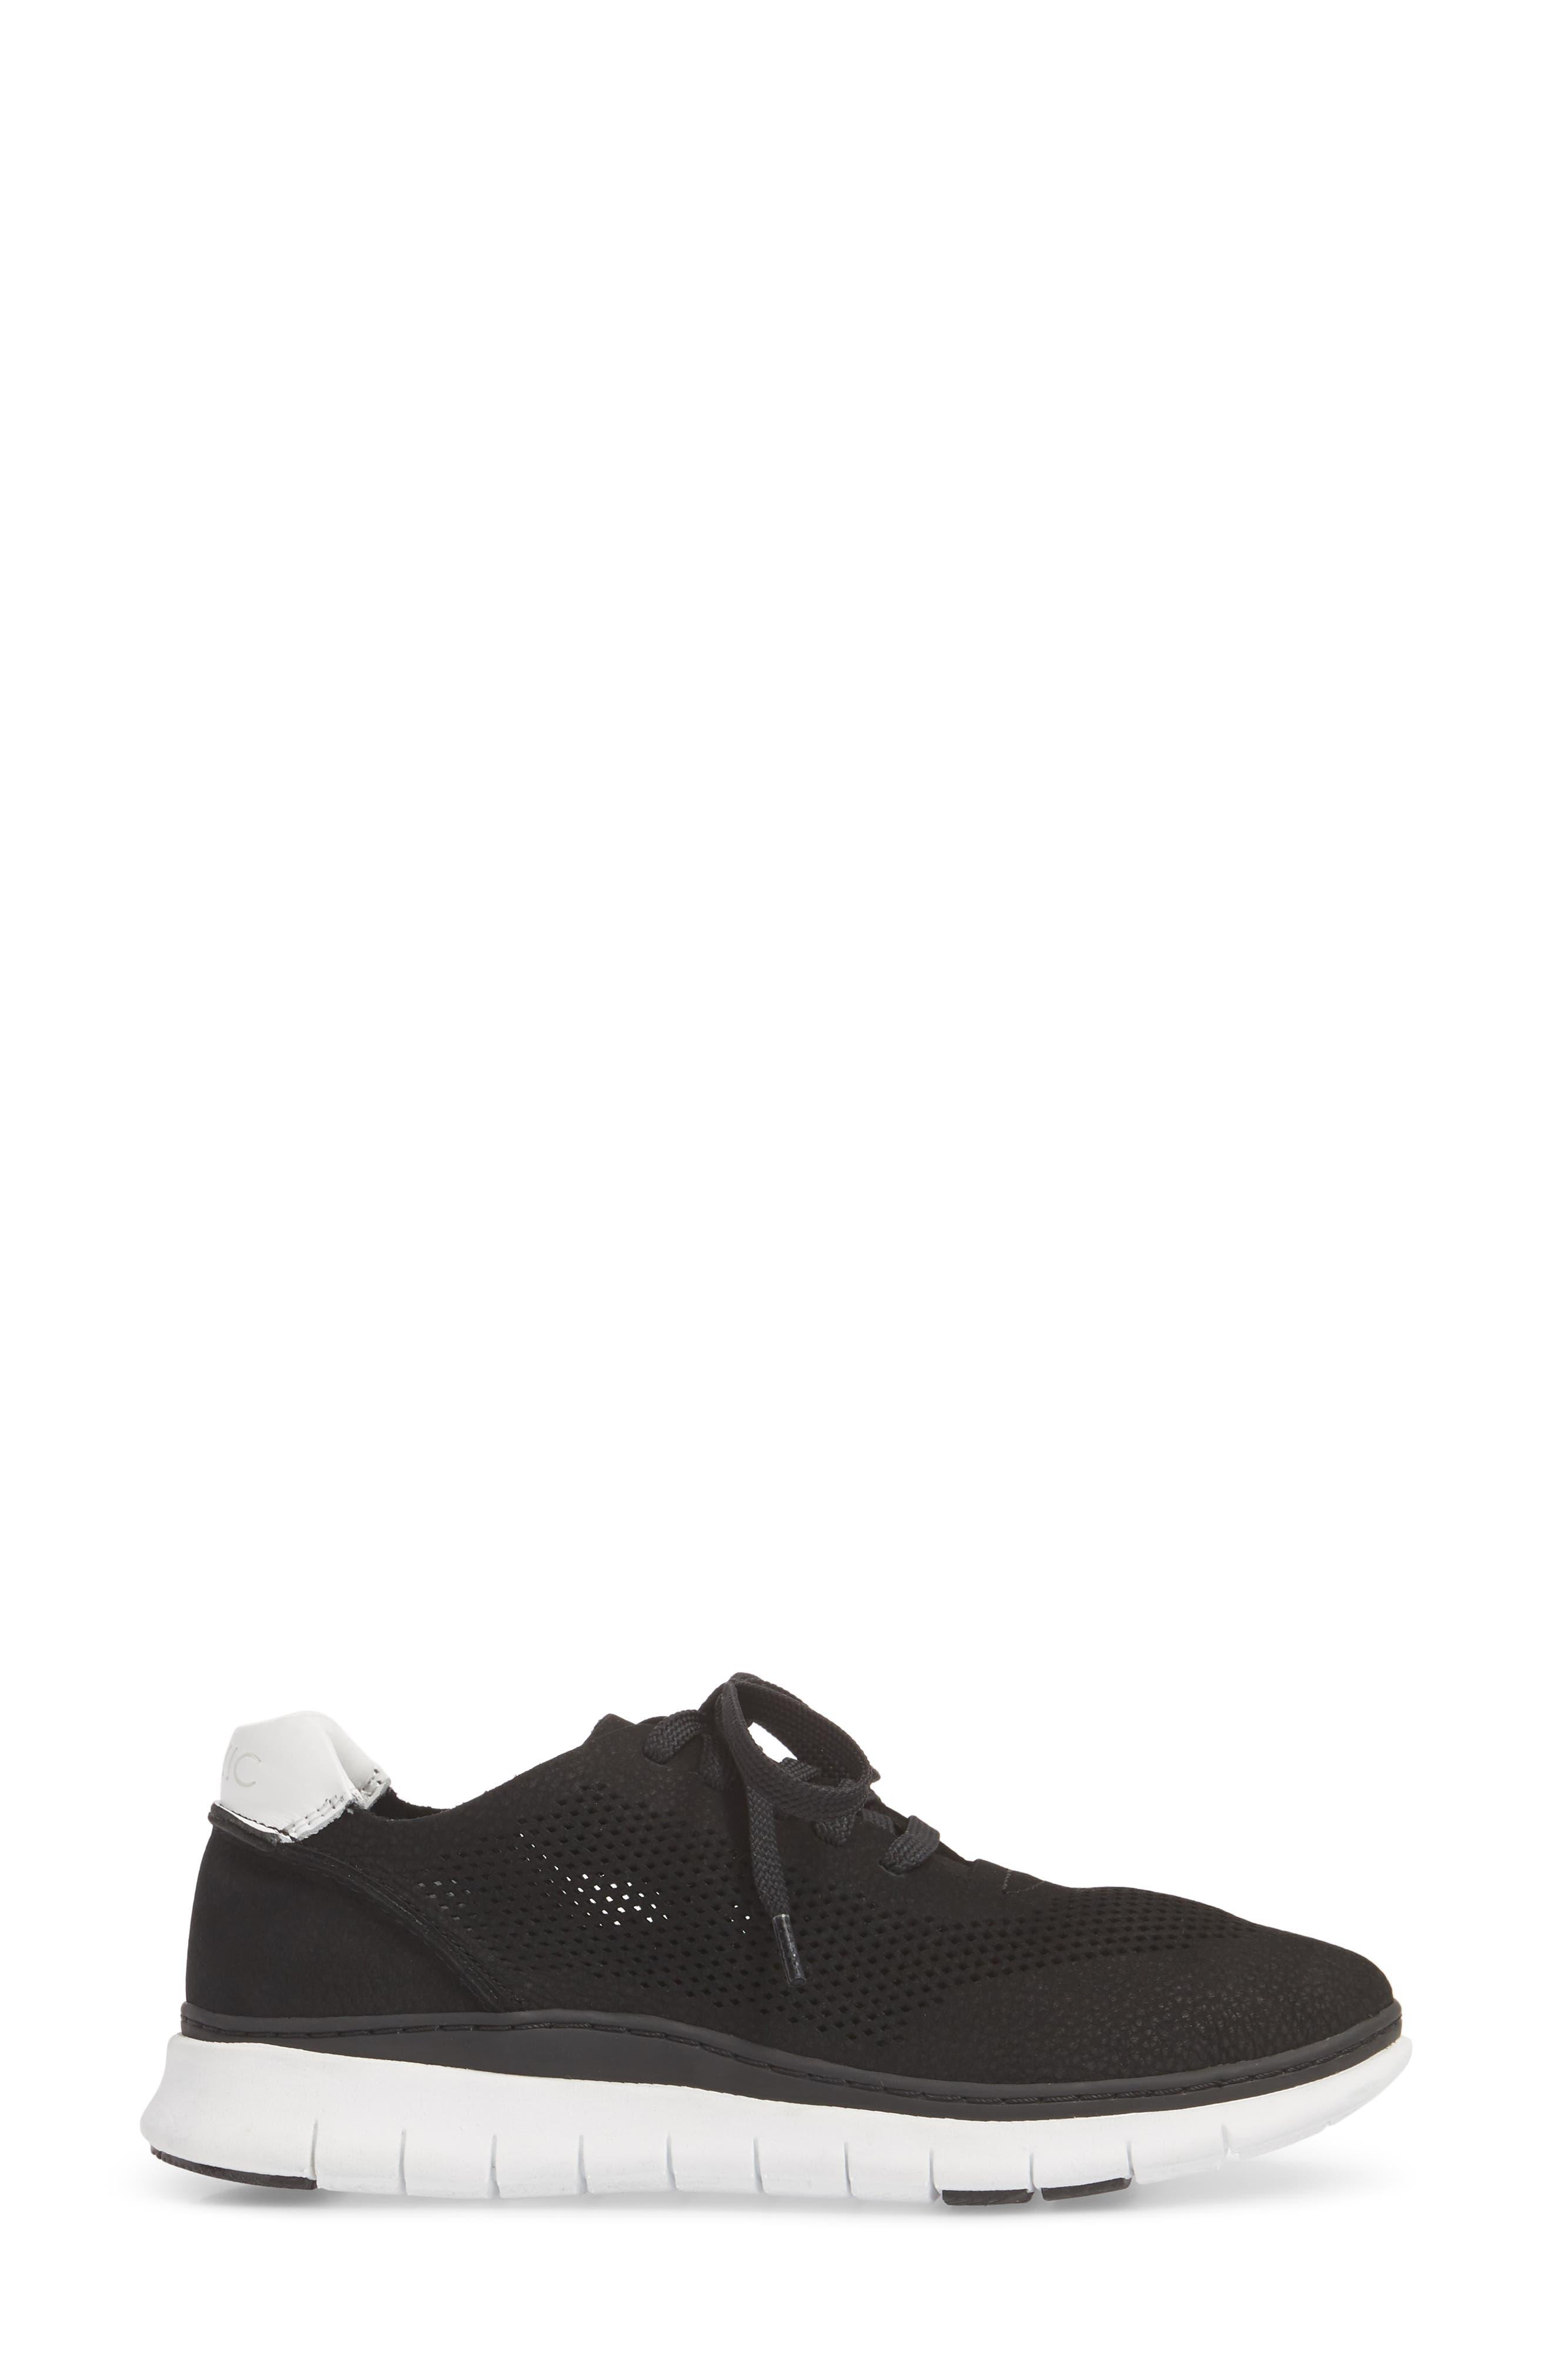 Joey Sneaker,                             Alternate thumbnail 3, color,                             BLACK NUBUCK LEATHER